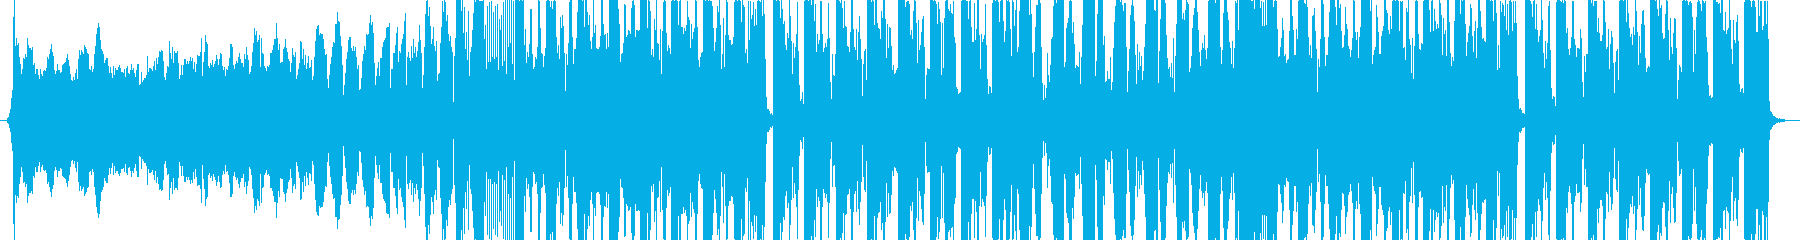 cyberpunk サイバーパンクの再生済みの波形